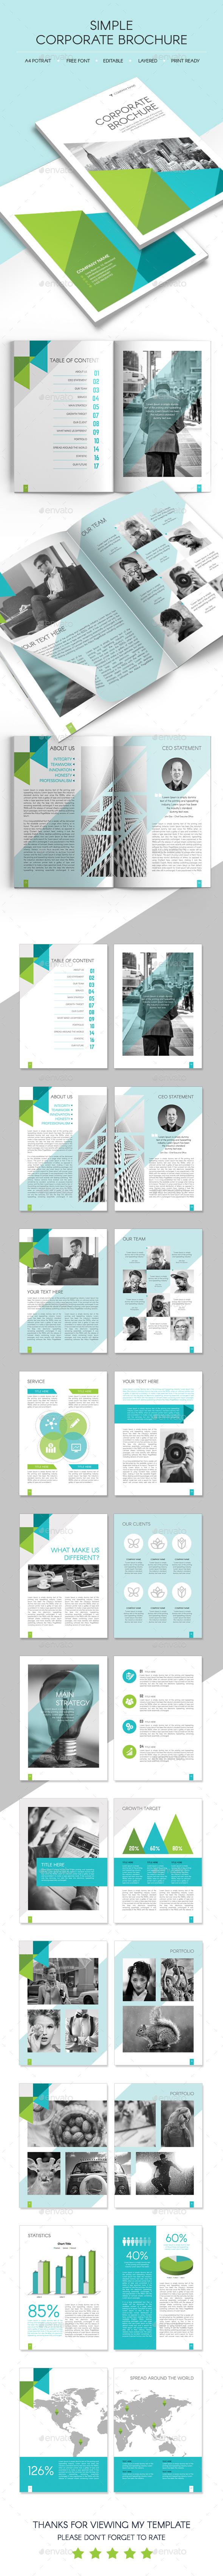 Simple Corporate Brochure - Corporate Brochures